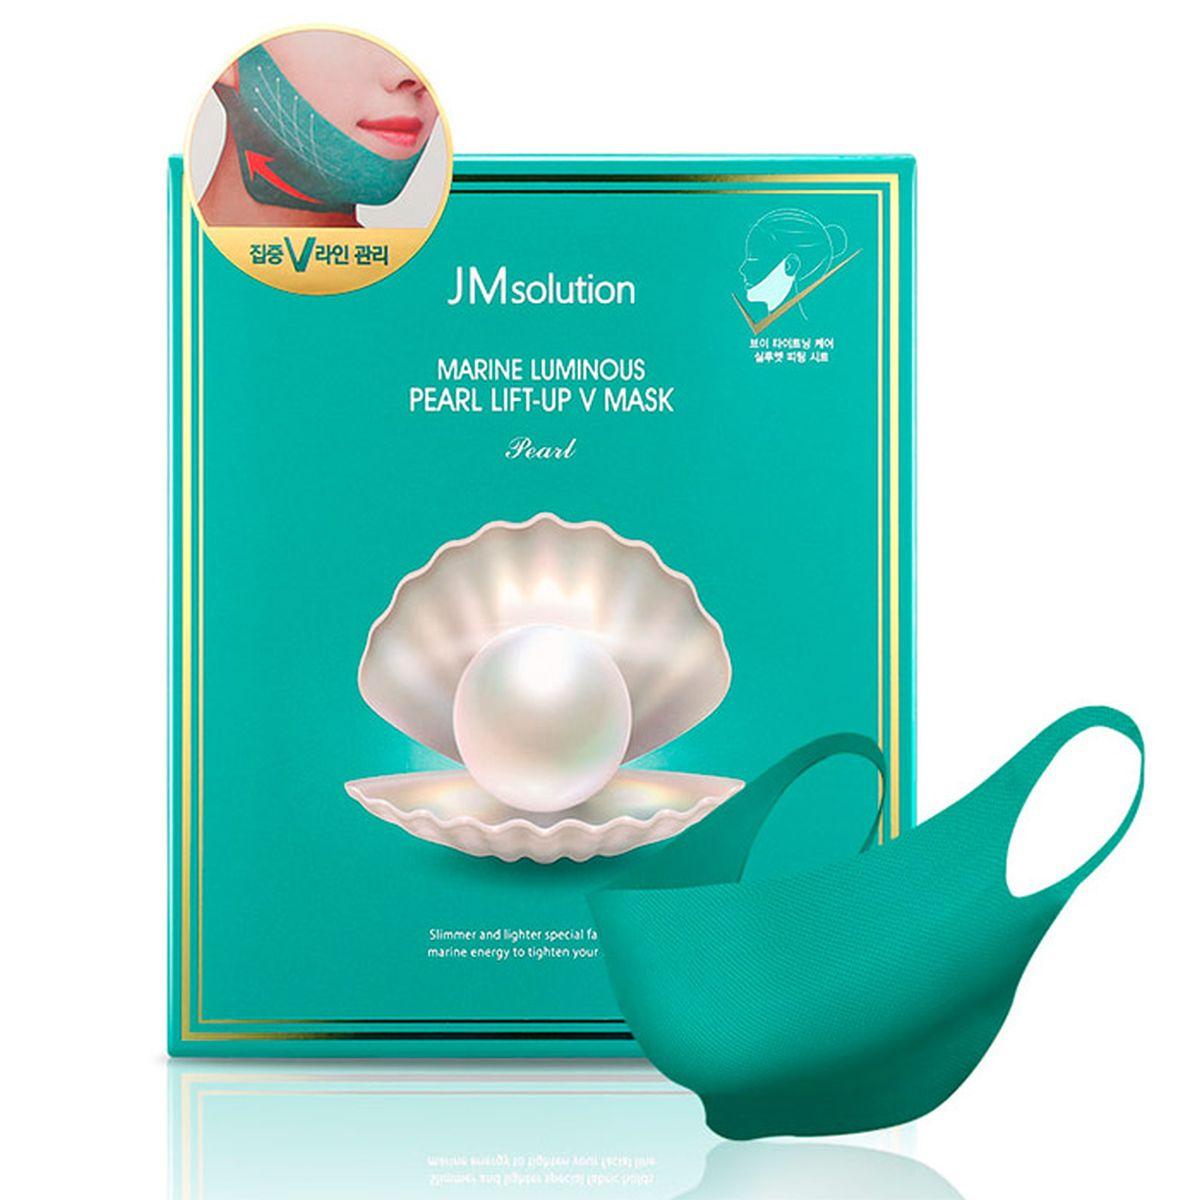 Лифтинг-маска для подбородка с жемчугом JMsolution Marine Luminous Pearl Lift-up V Mask - 25 гр